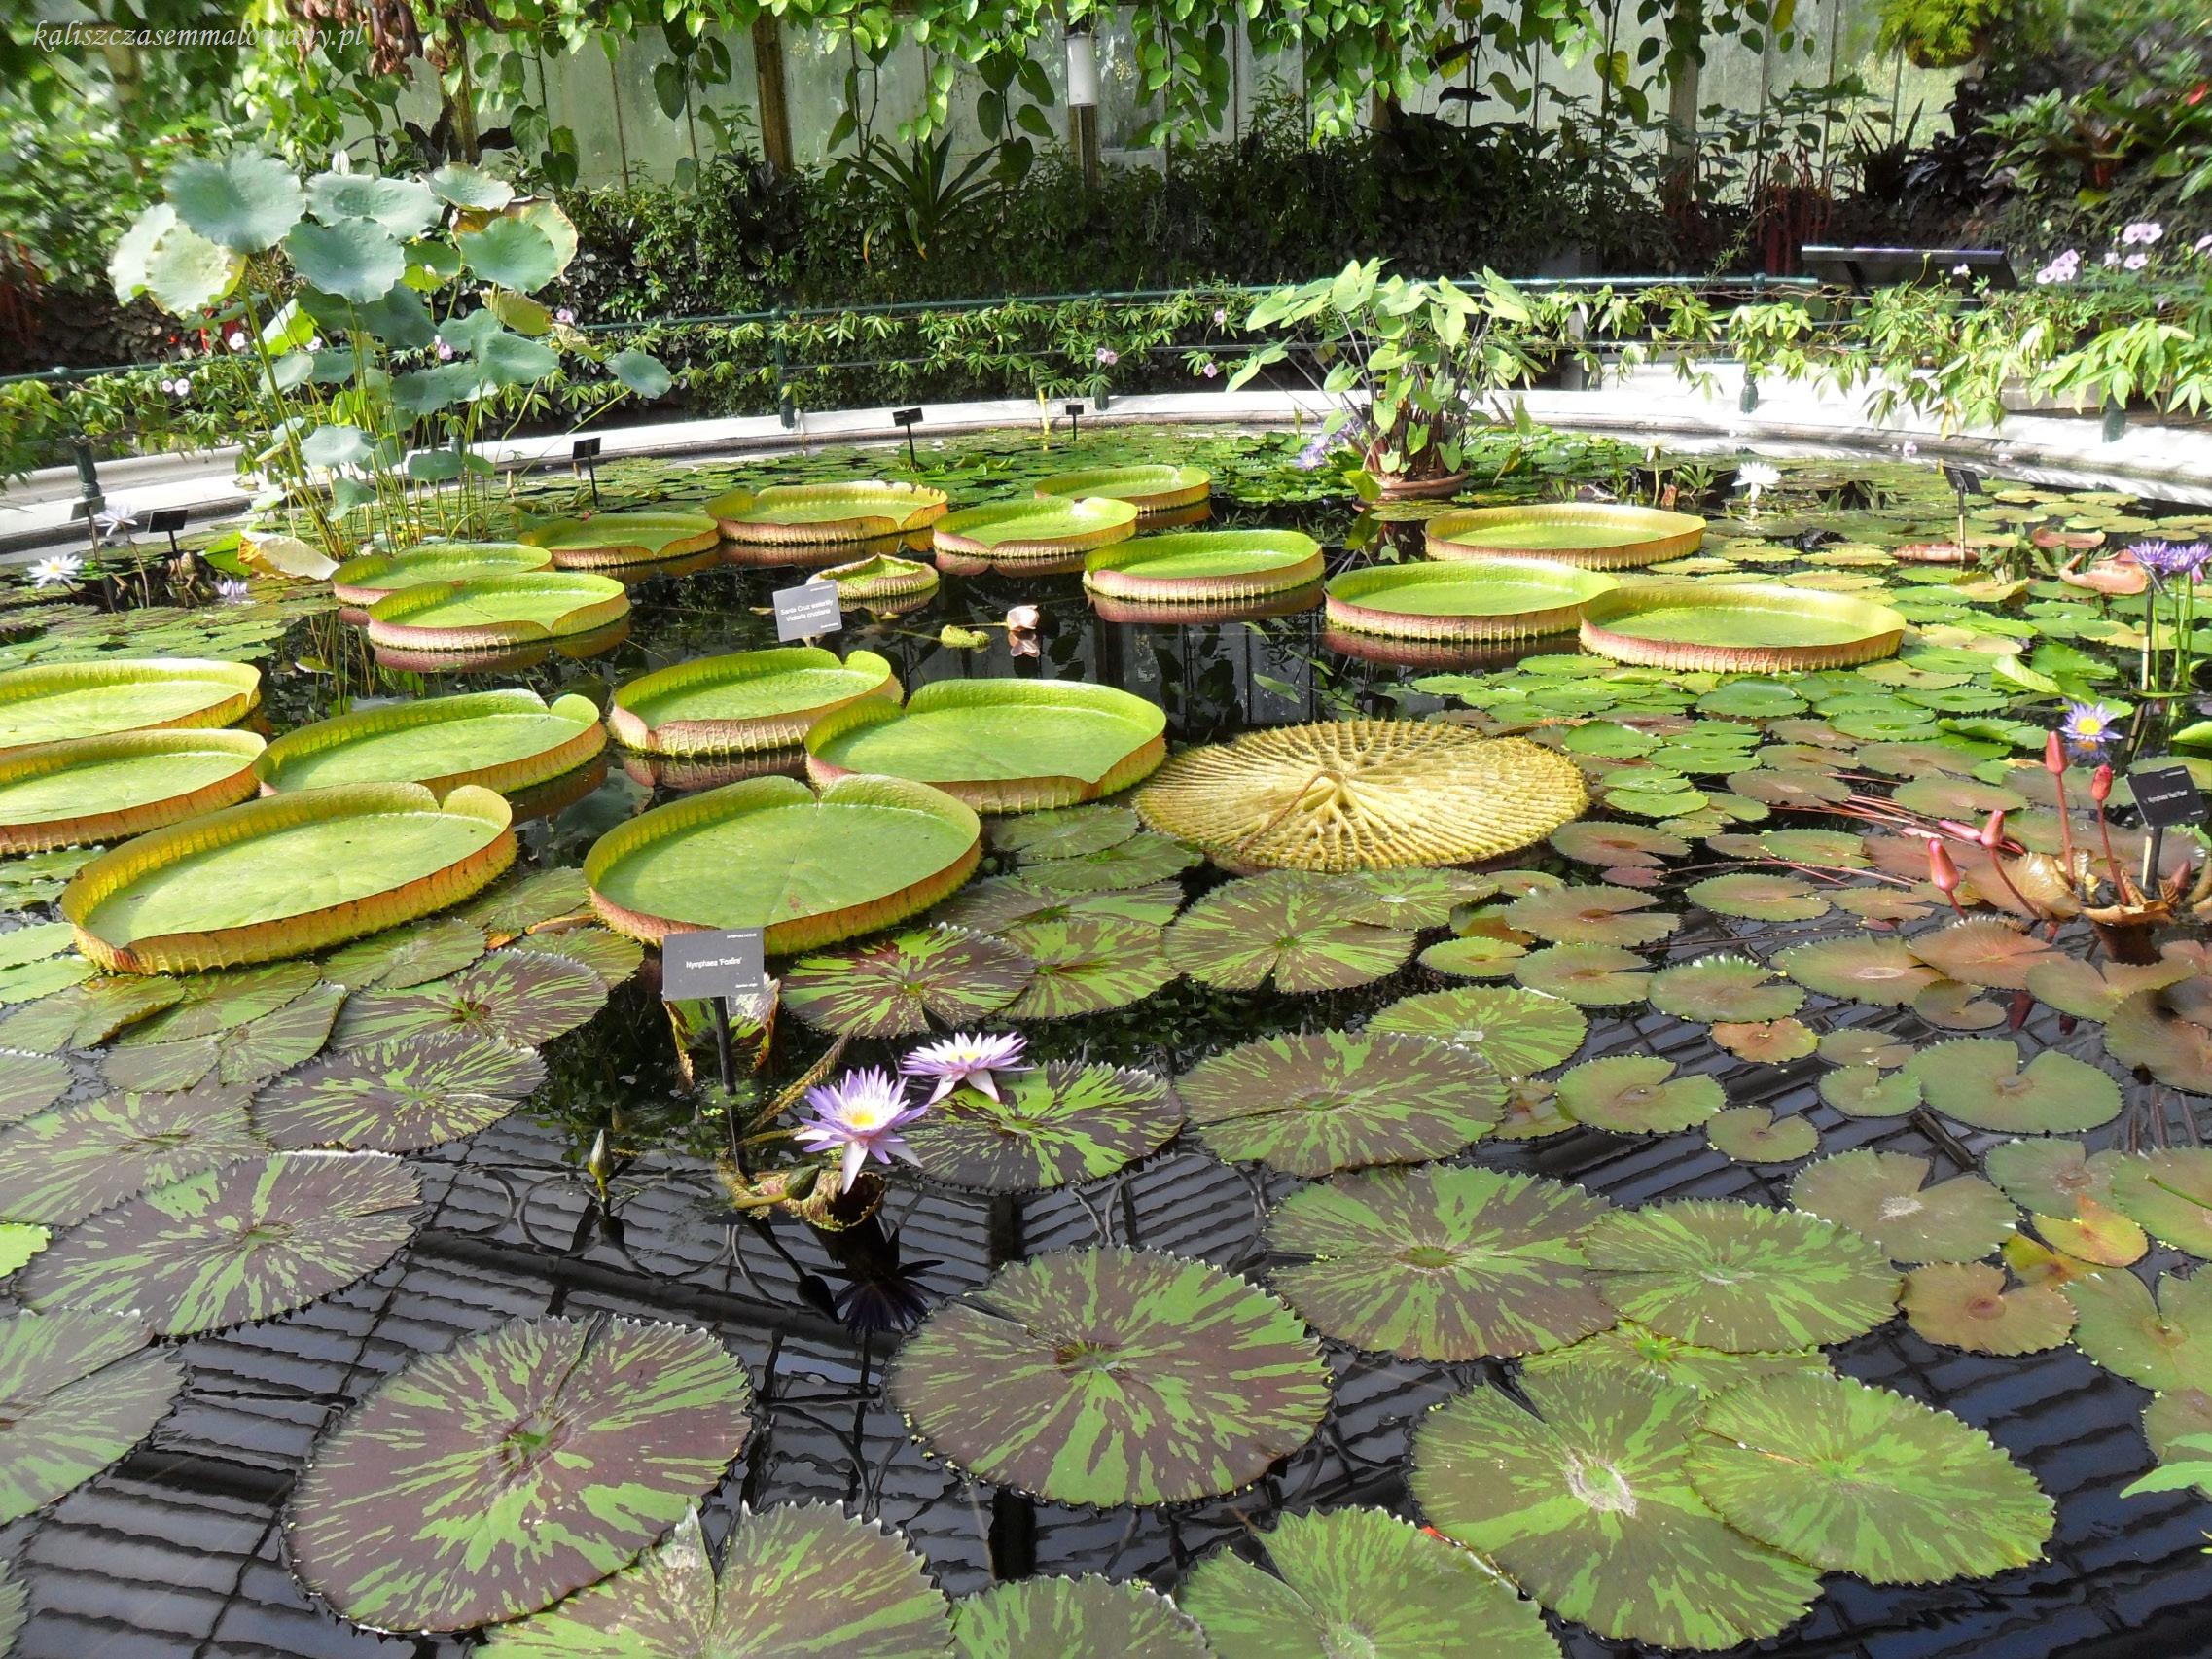 Kew_Garden-24